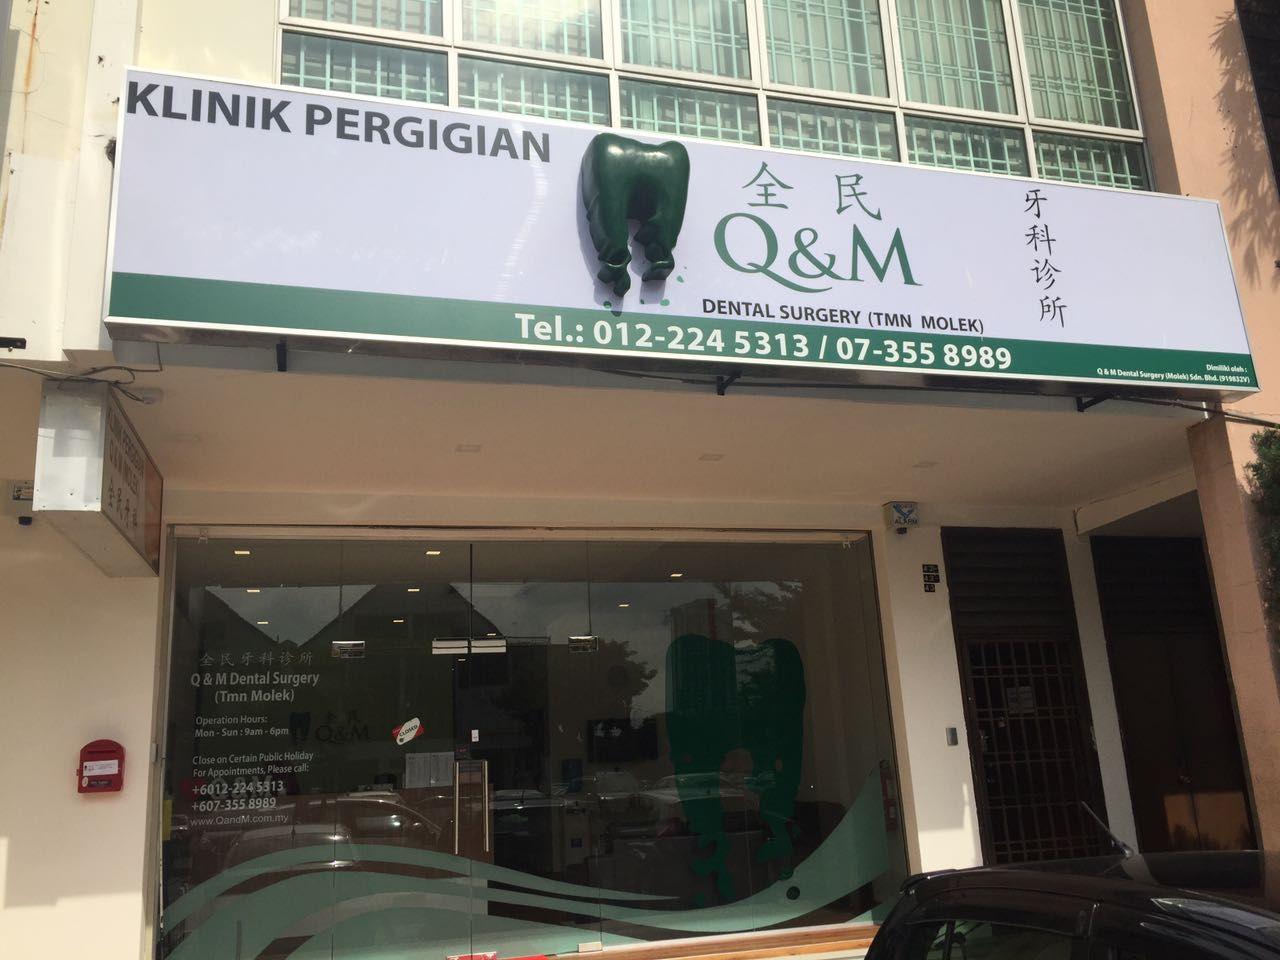 Q&M Dental Surgery (Tmn Molek)